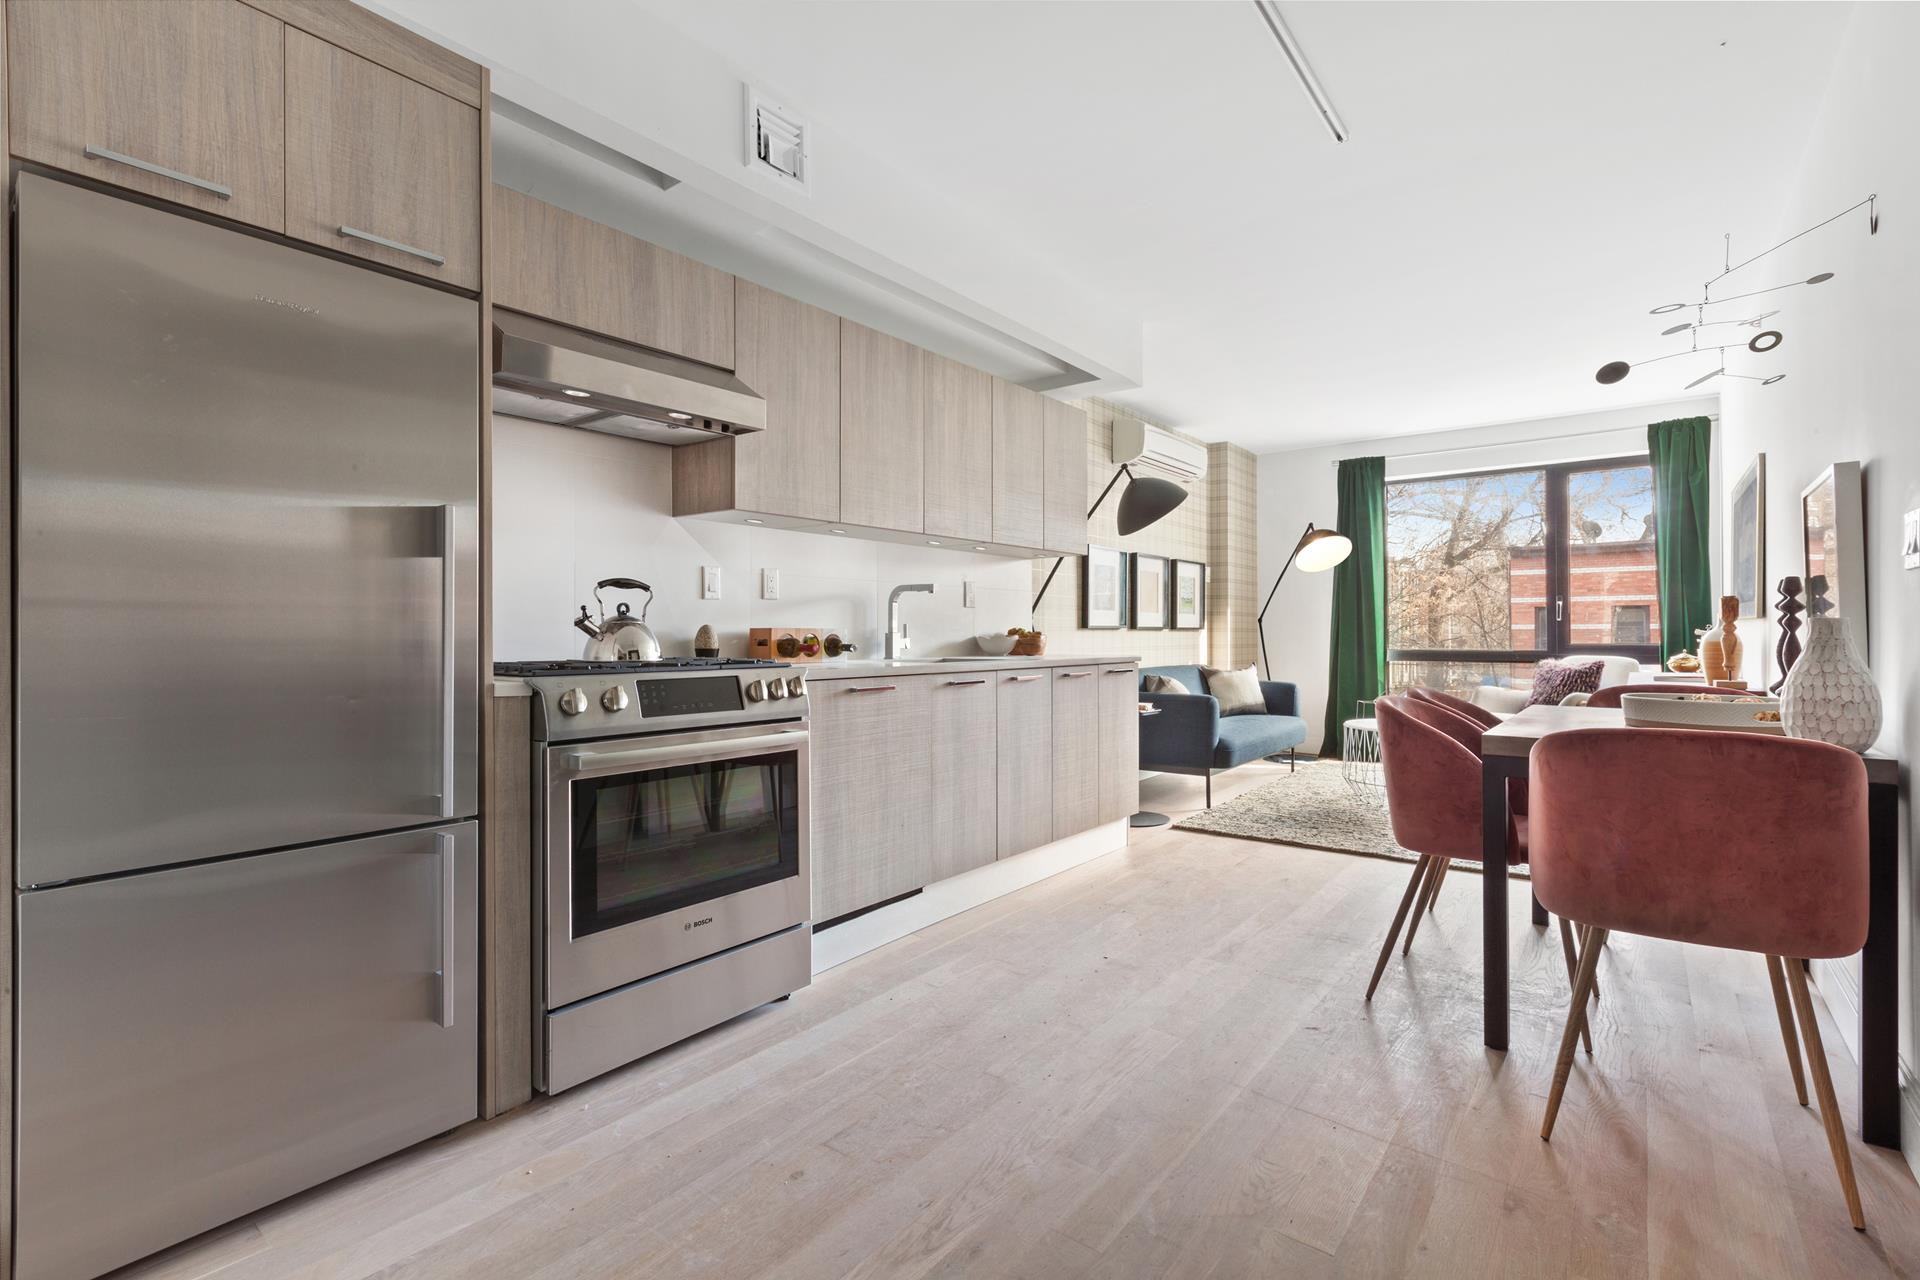 189 Cooper St, 2C - Bushwick, New York